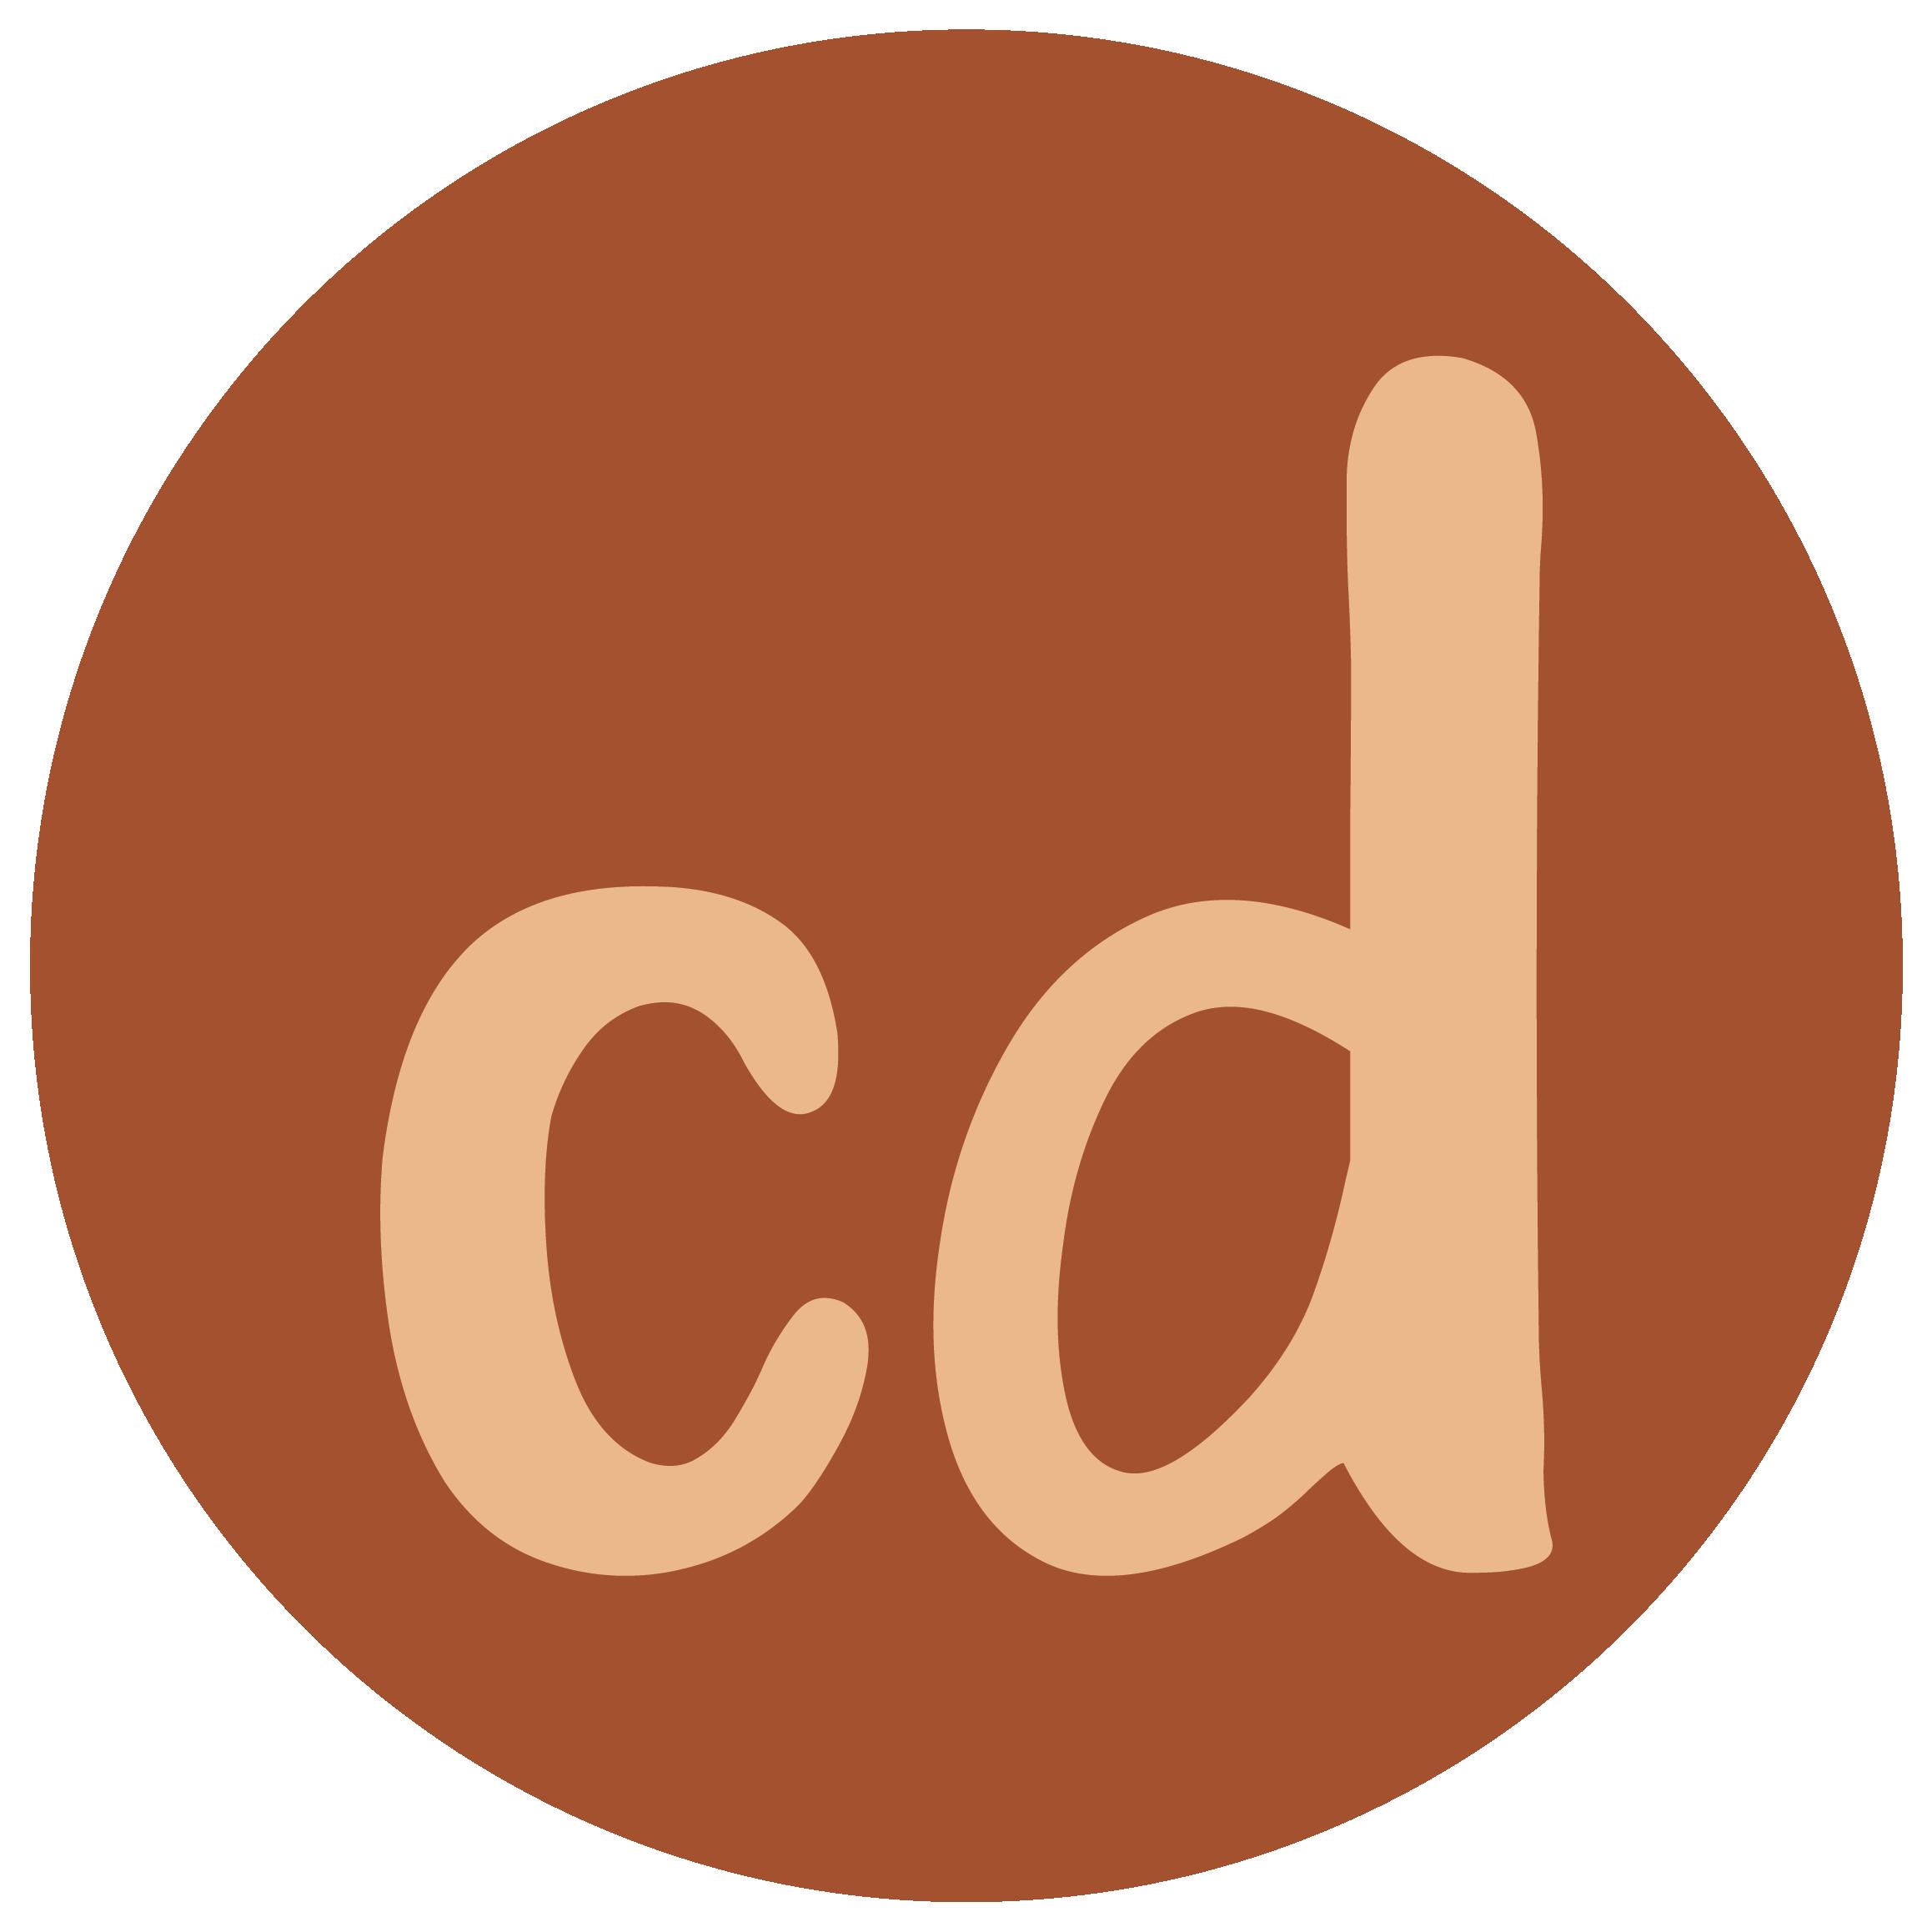 CocoaDotz_thumbnail_cdb.png